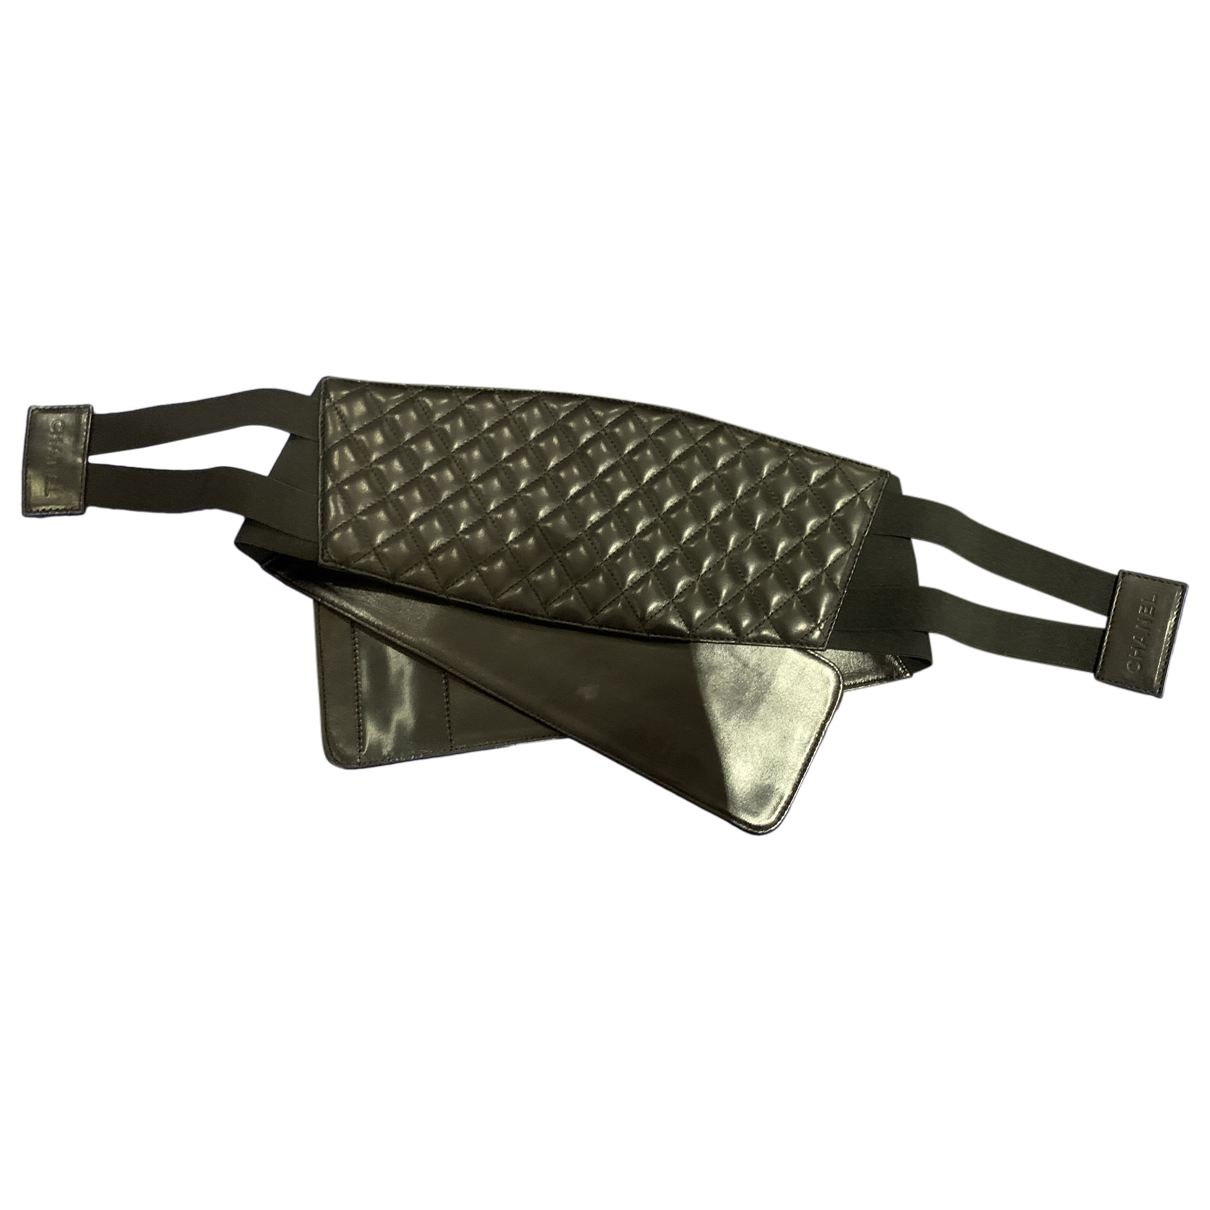 Chanel \N Black Leather belt for Women M International